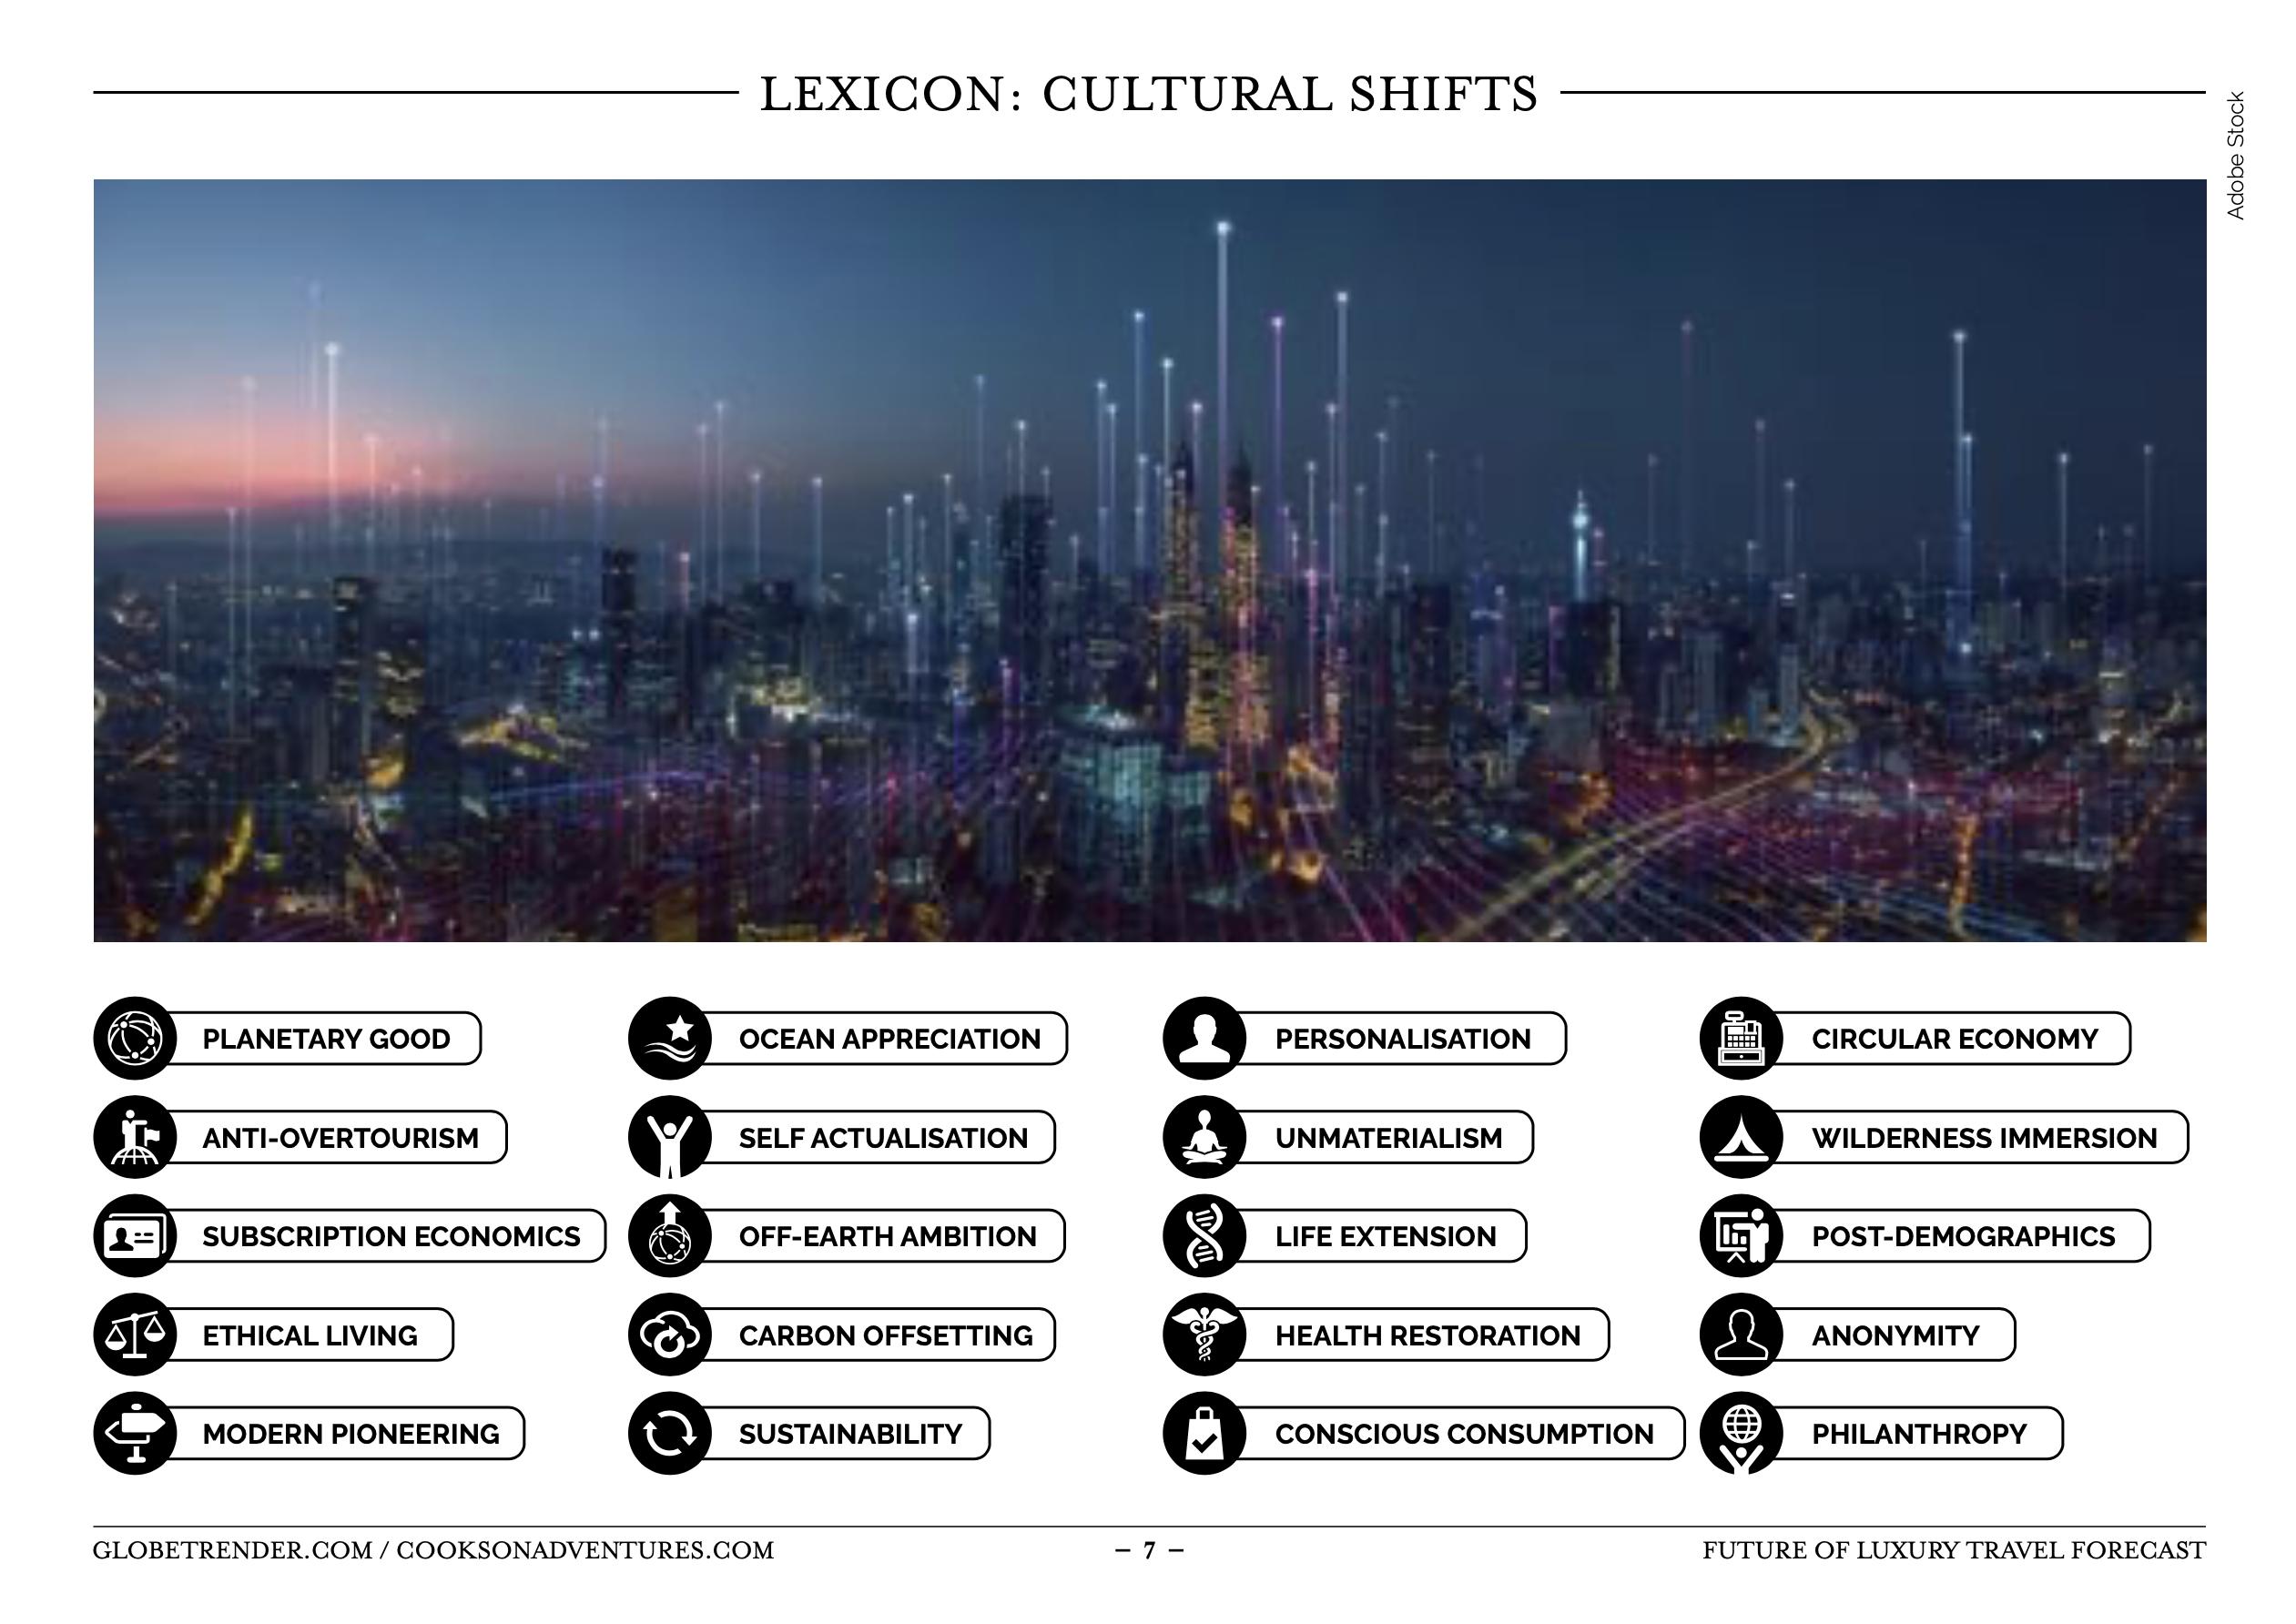 Luxury lexicon